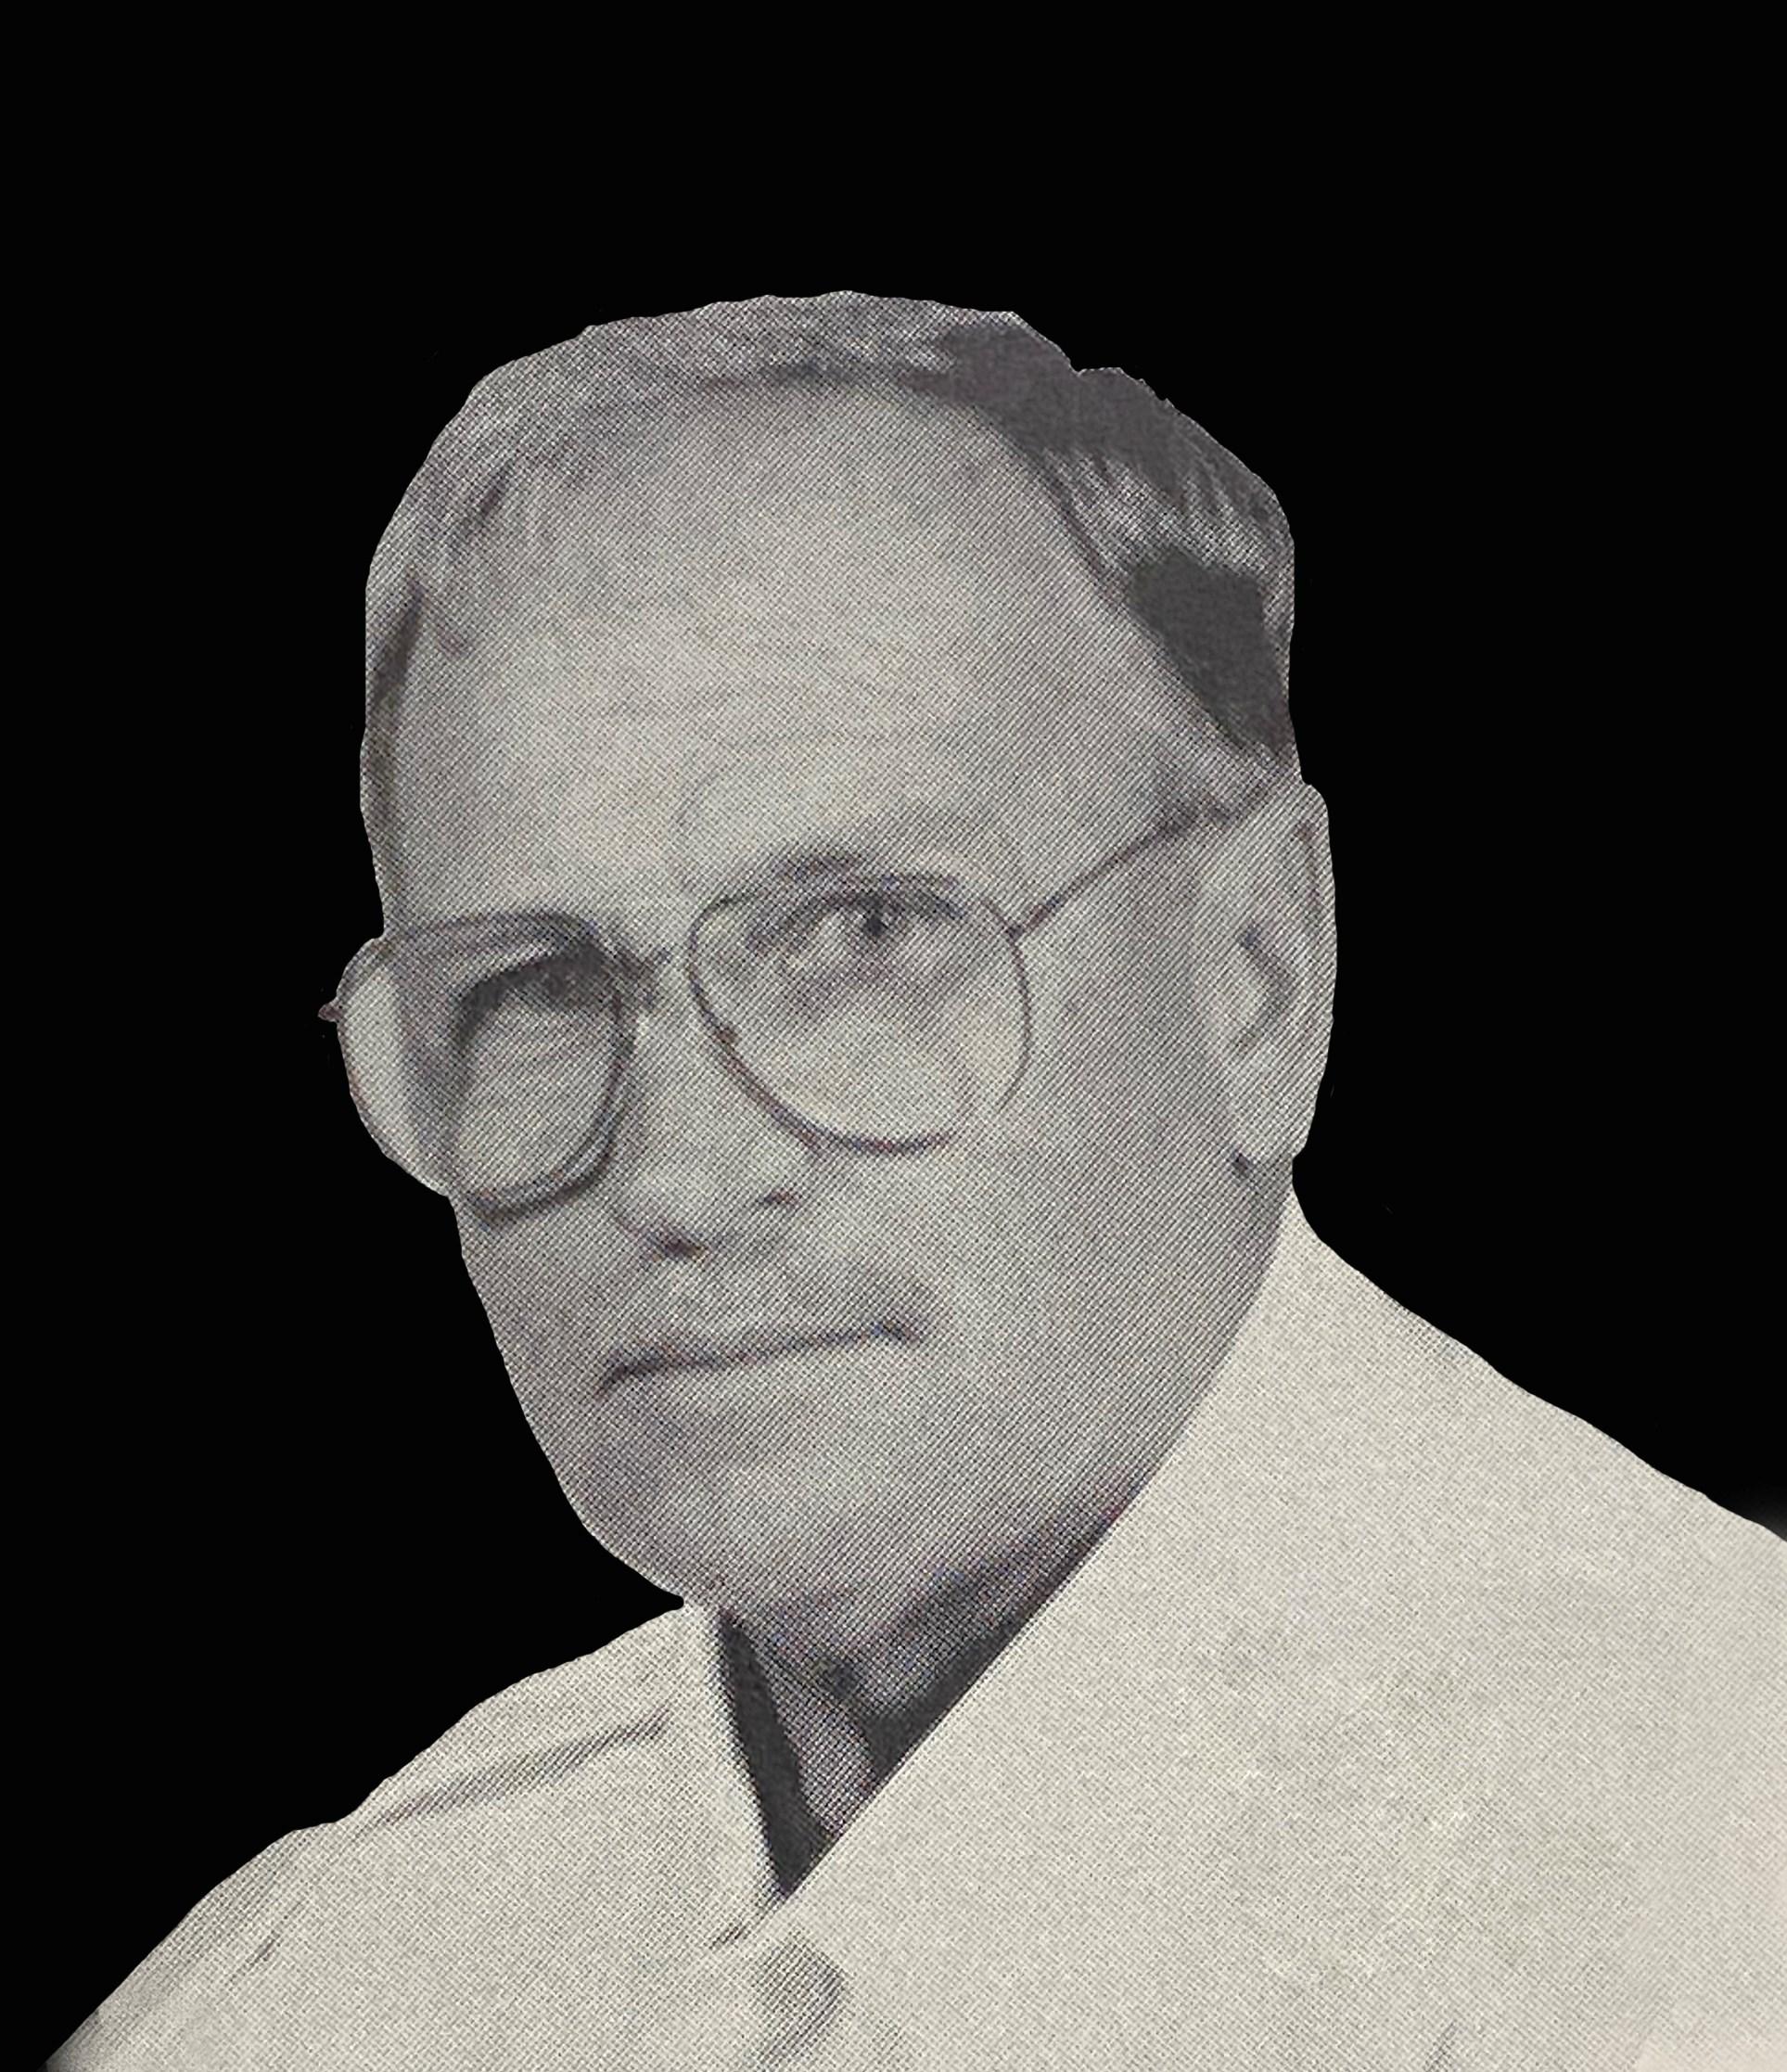 Daniel J. O'Brien